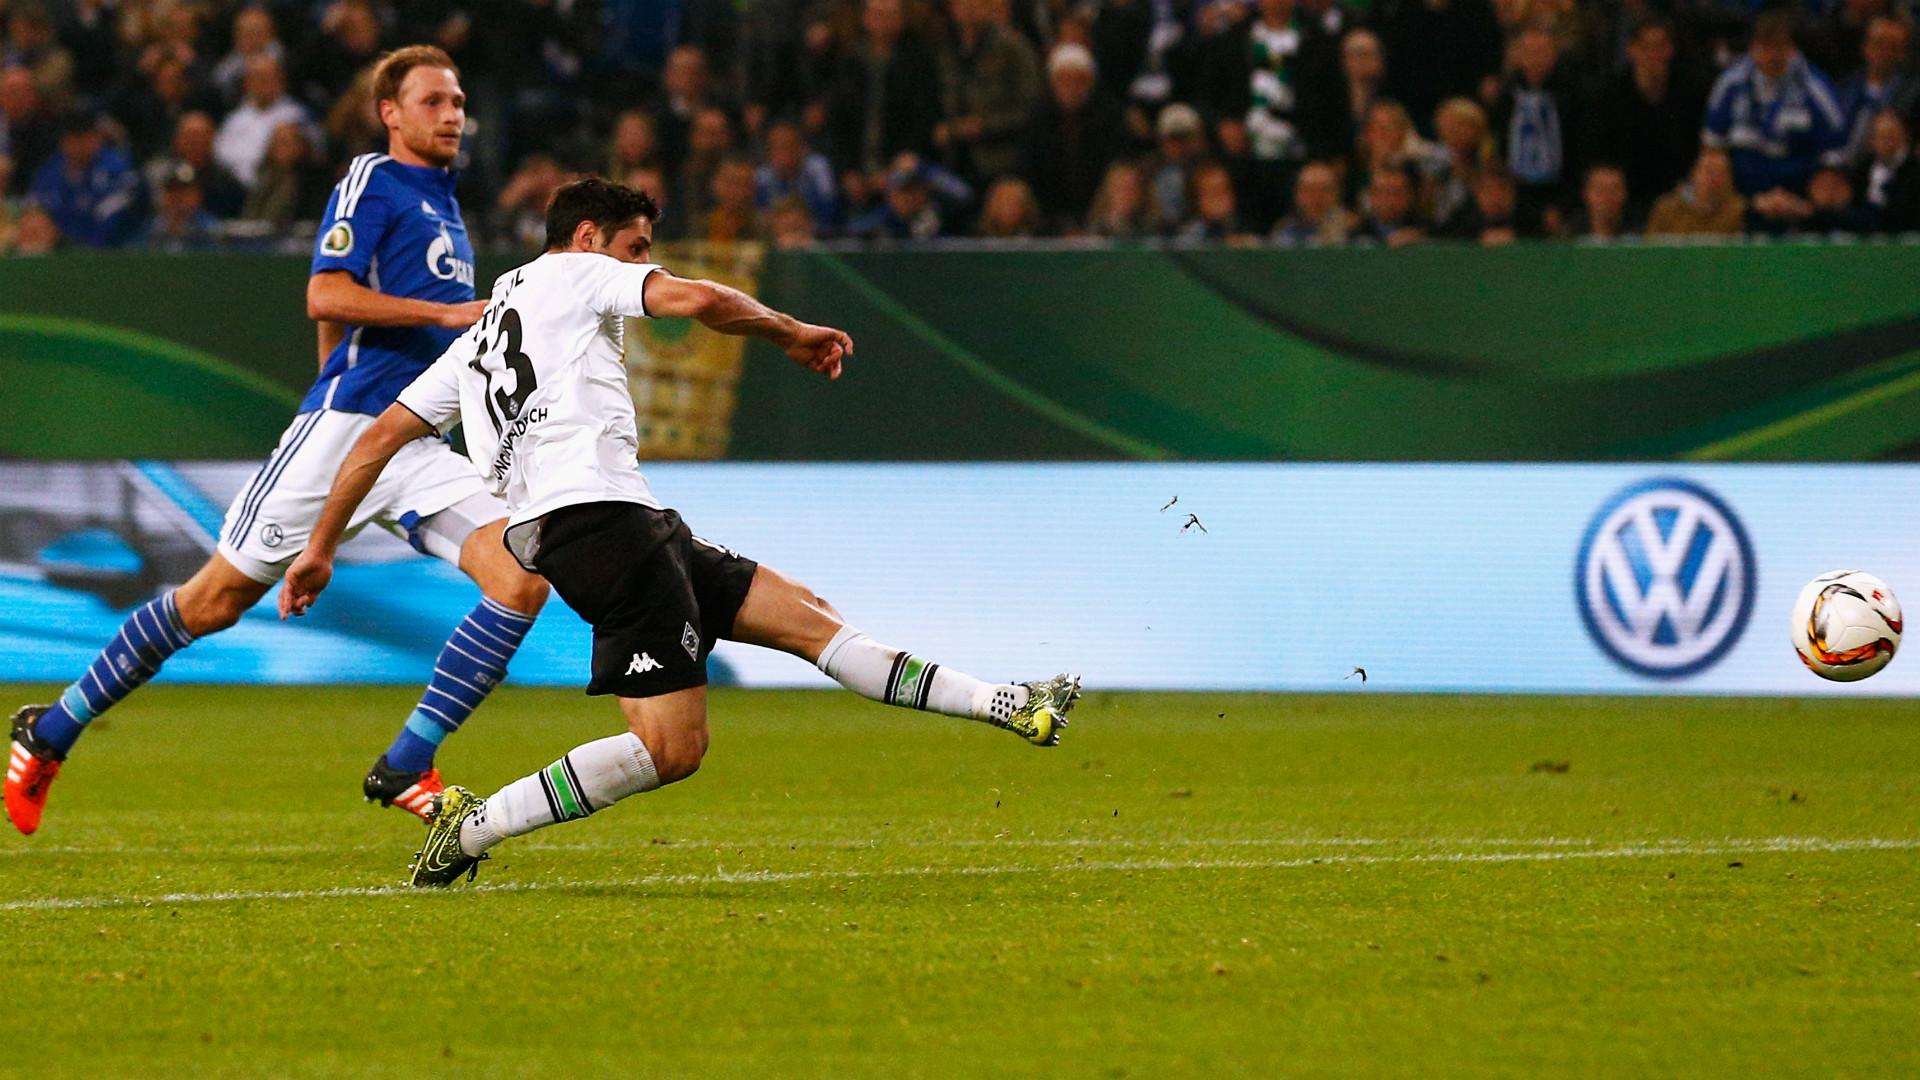 Video: Schalke 04 vs Borussia M gladbach